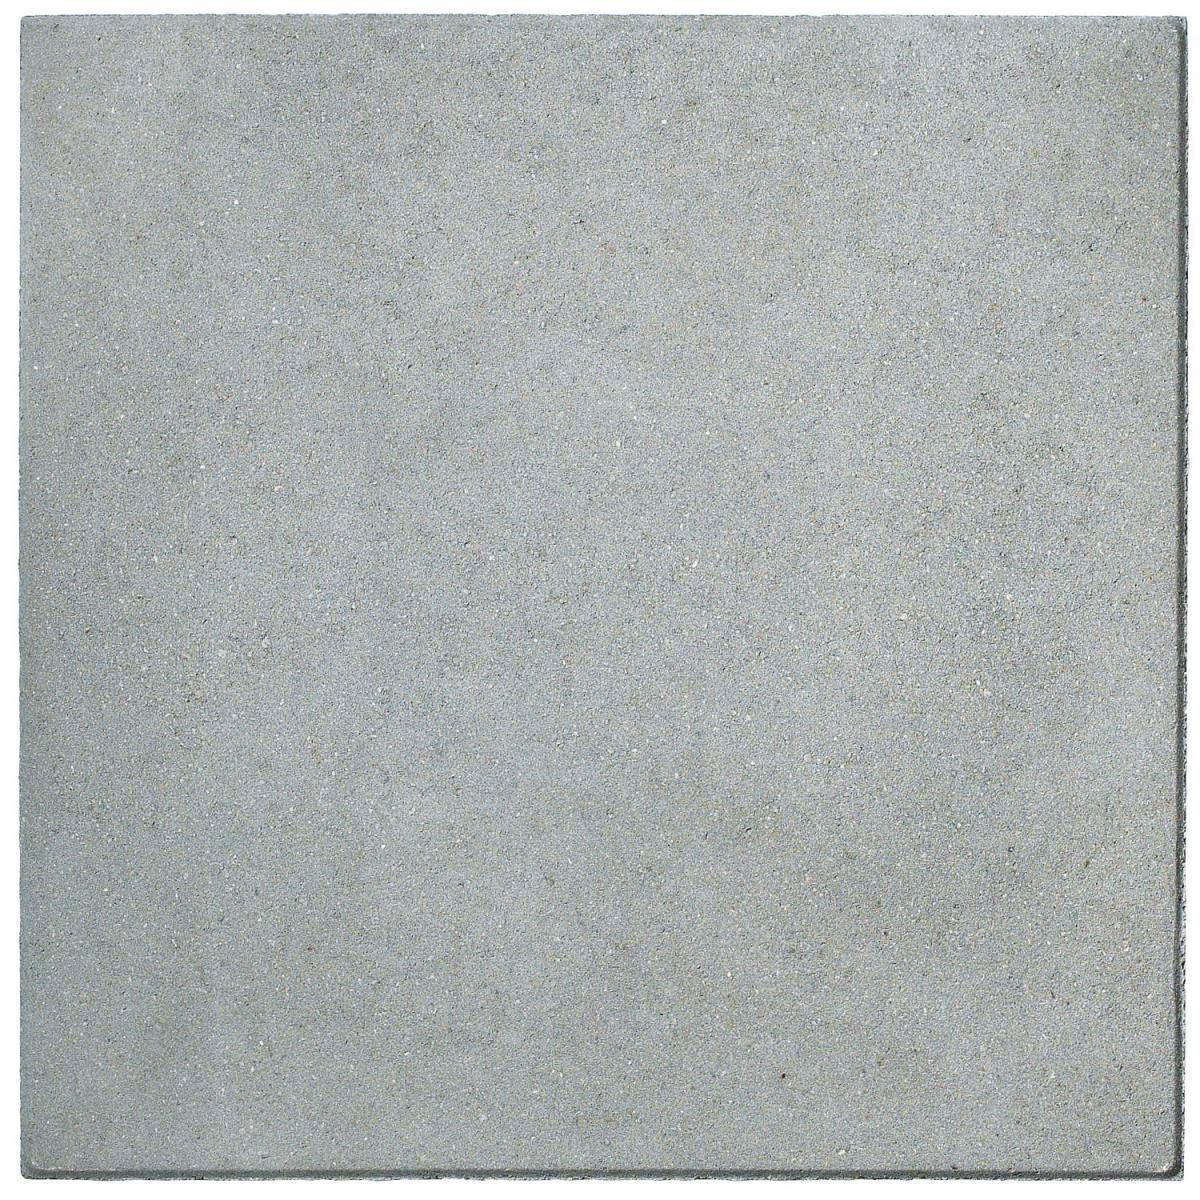 Beton Gehwegplatte, 20x20x20 cm, grau bei HELLWEG